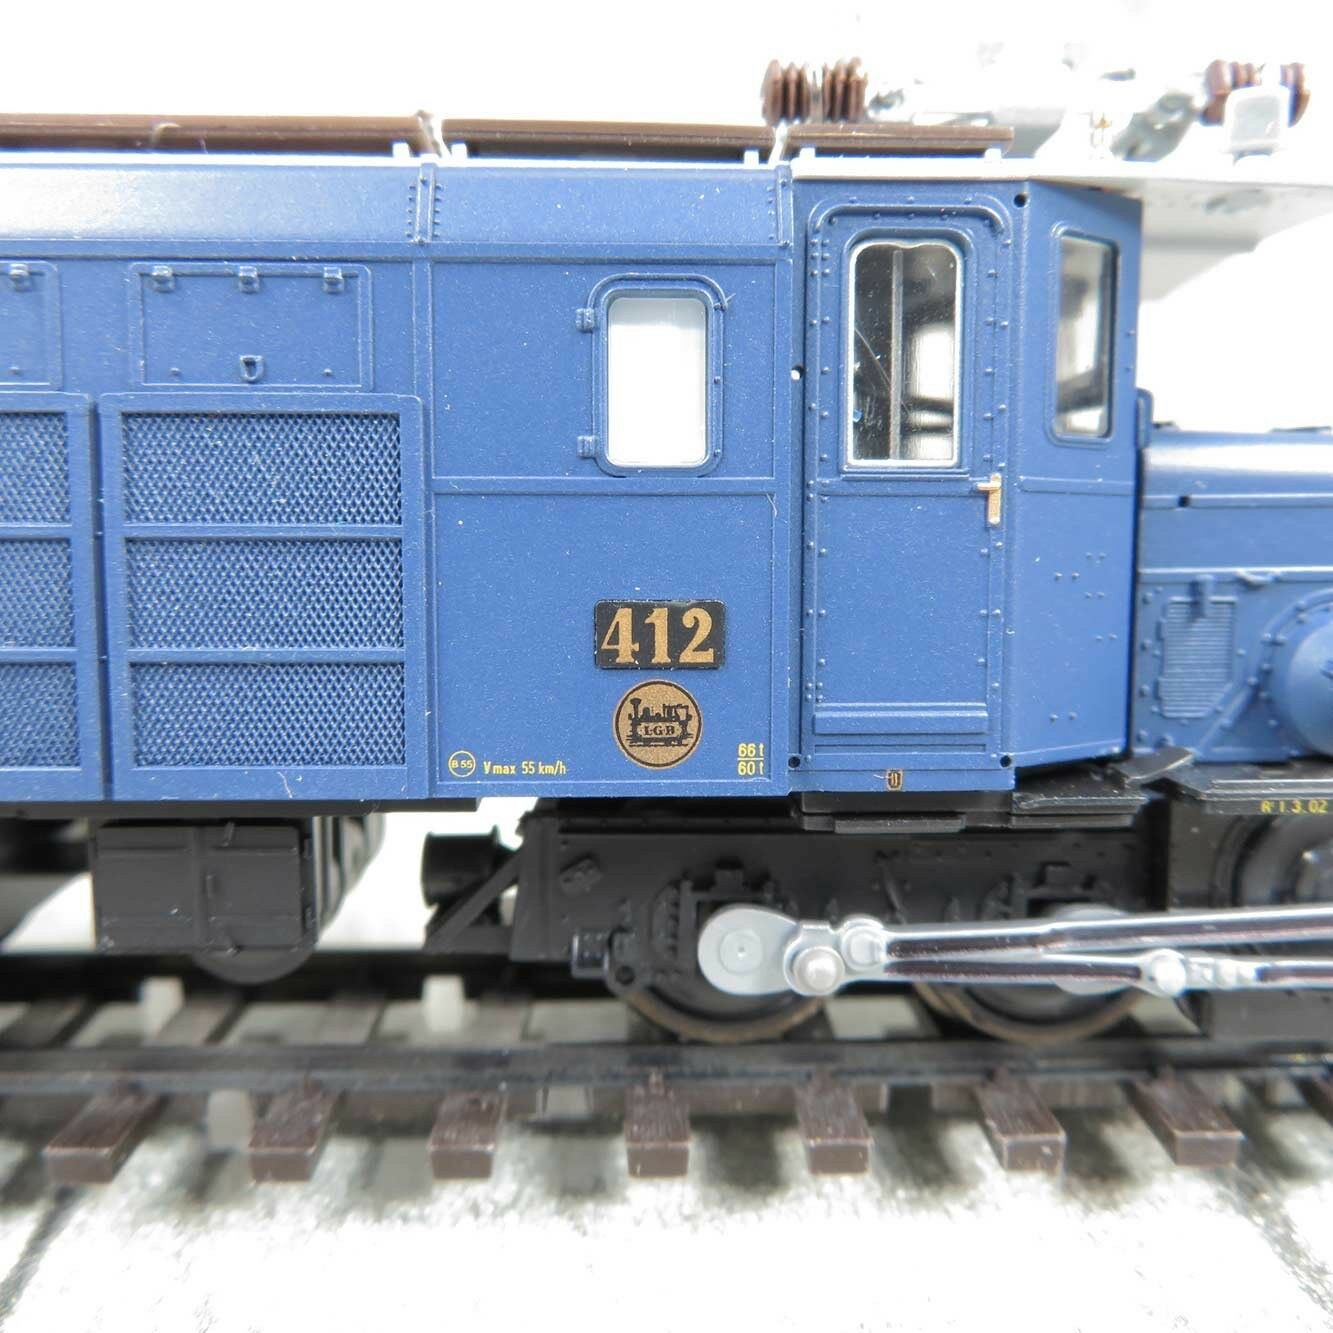 BEMO 1255 142 - H0m - RhB 412 - - -  Ge 6 6 75J. Glacier Express - OVP  U22198 dc50cb